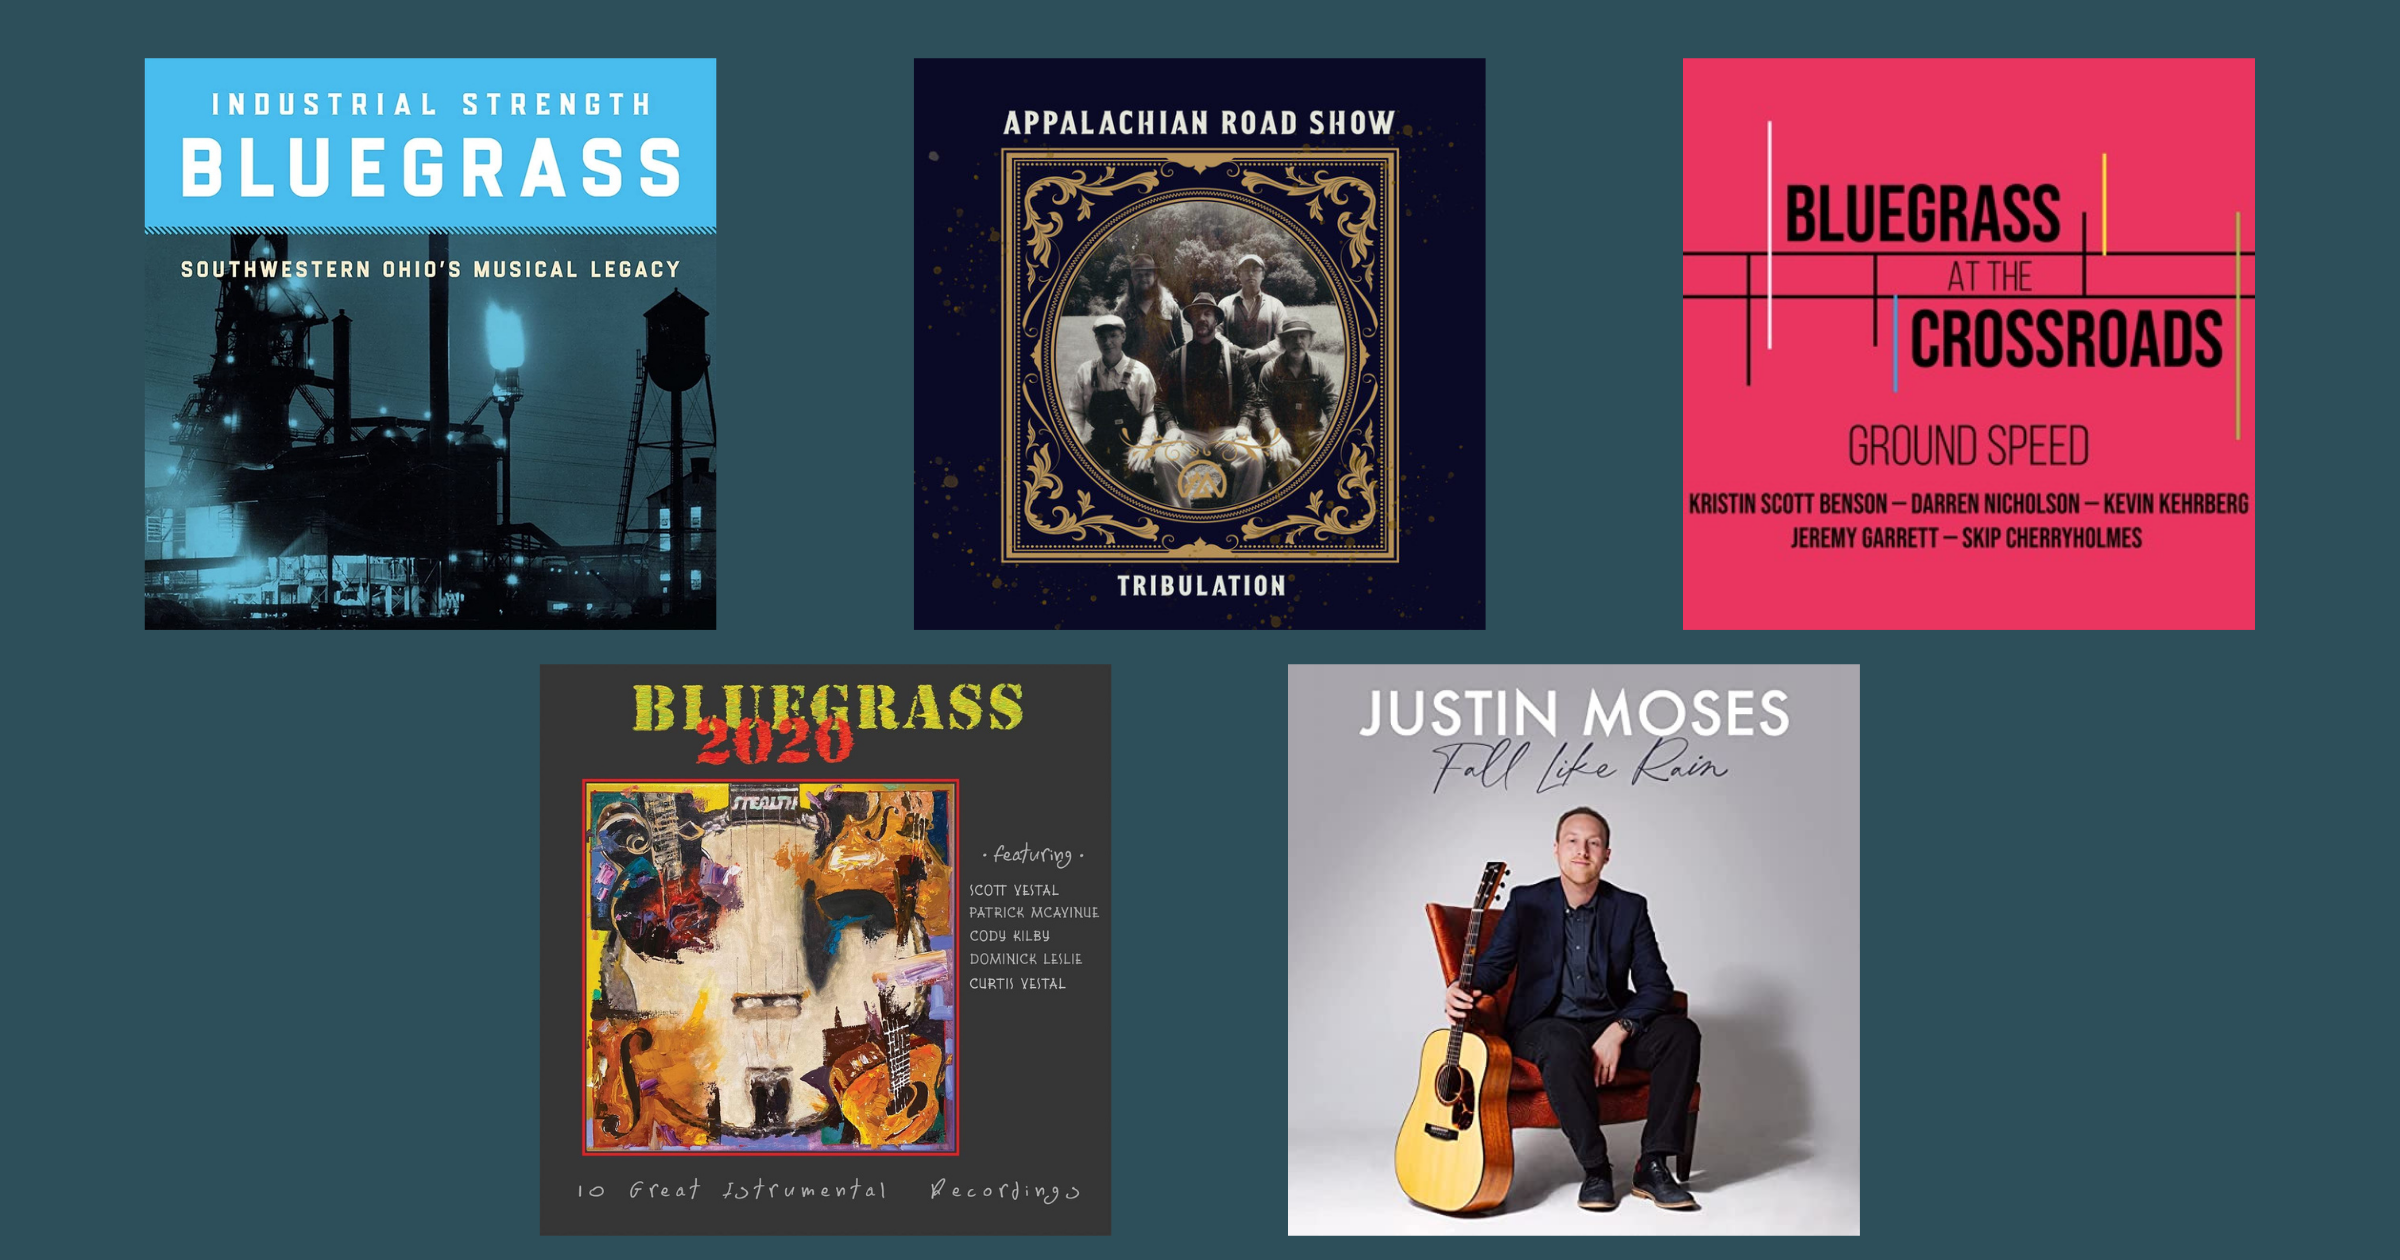 So Many Supergroups: Hear IBMA's 2021 Instrumental Recording Nominees